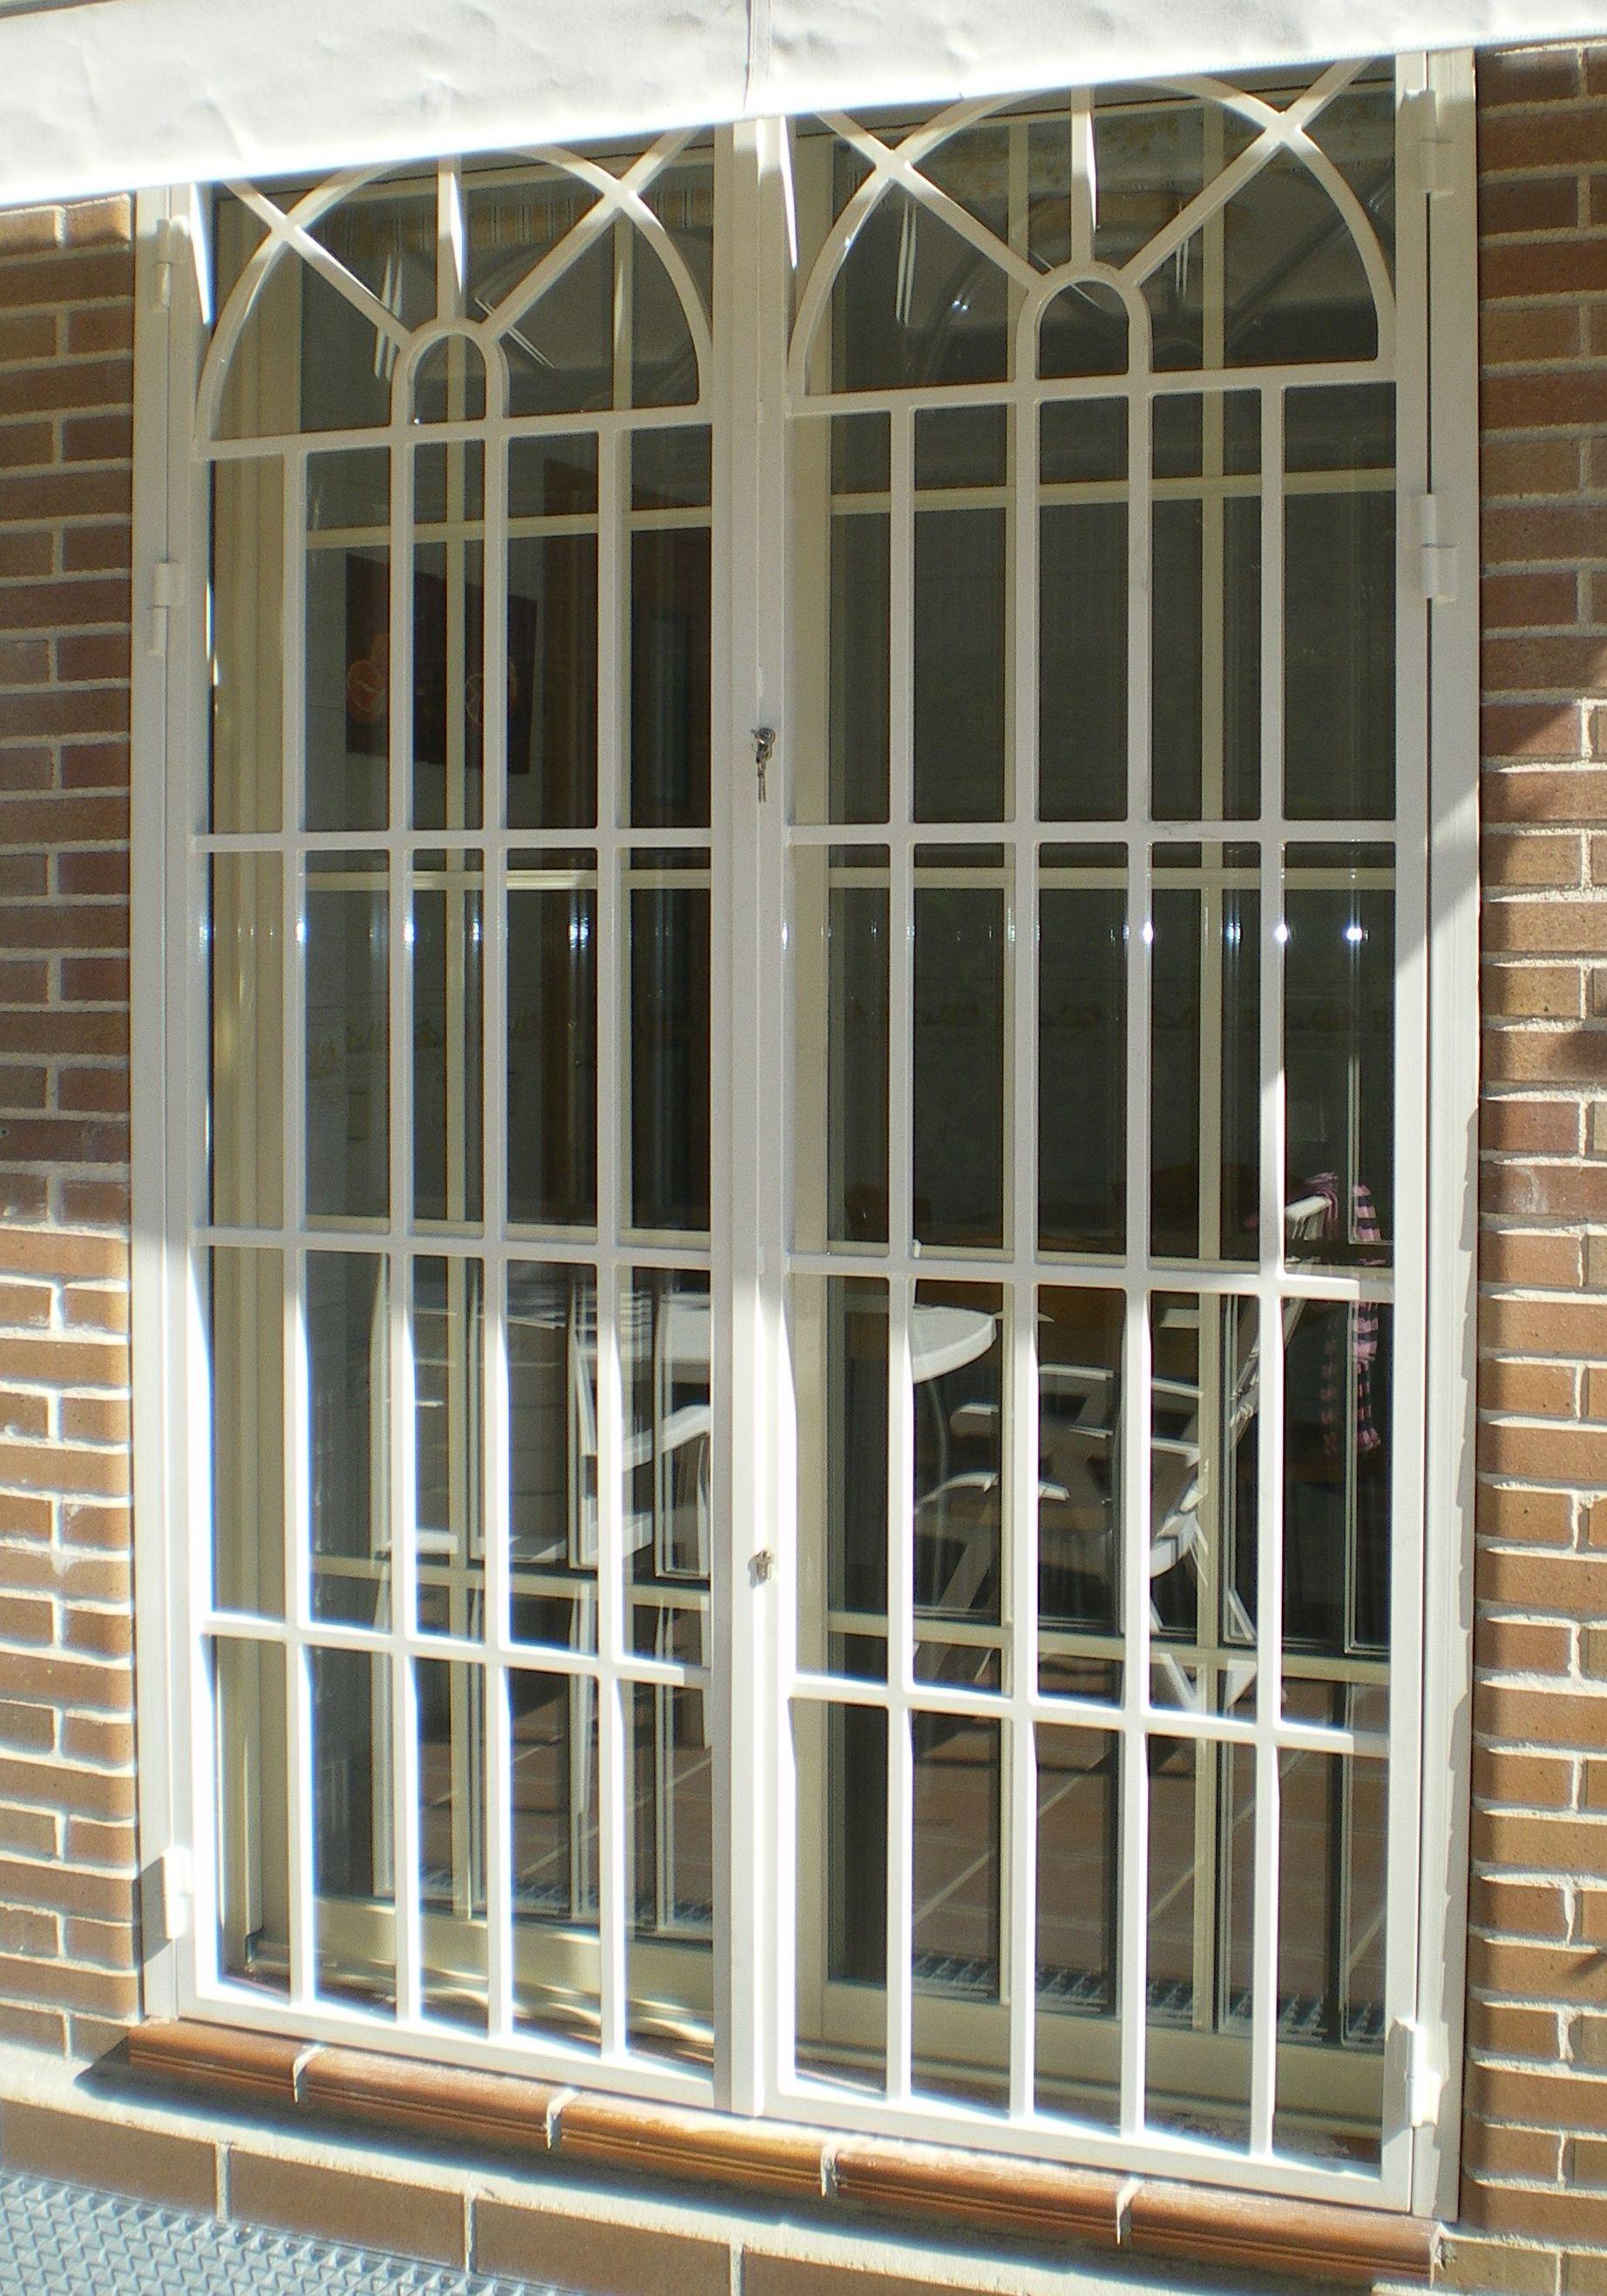 R4 - Reja de puertas